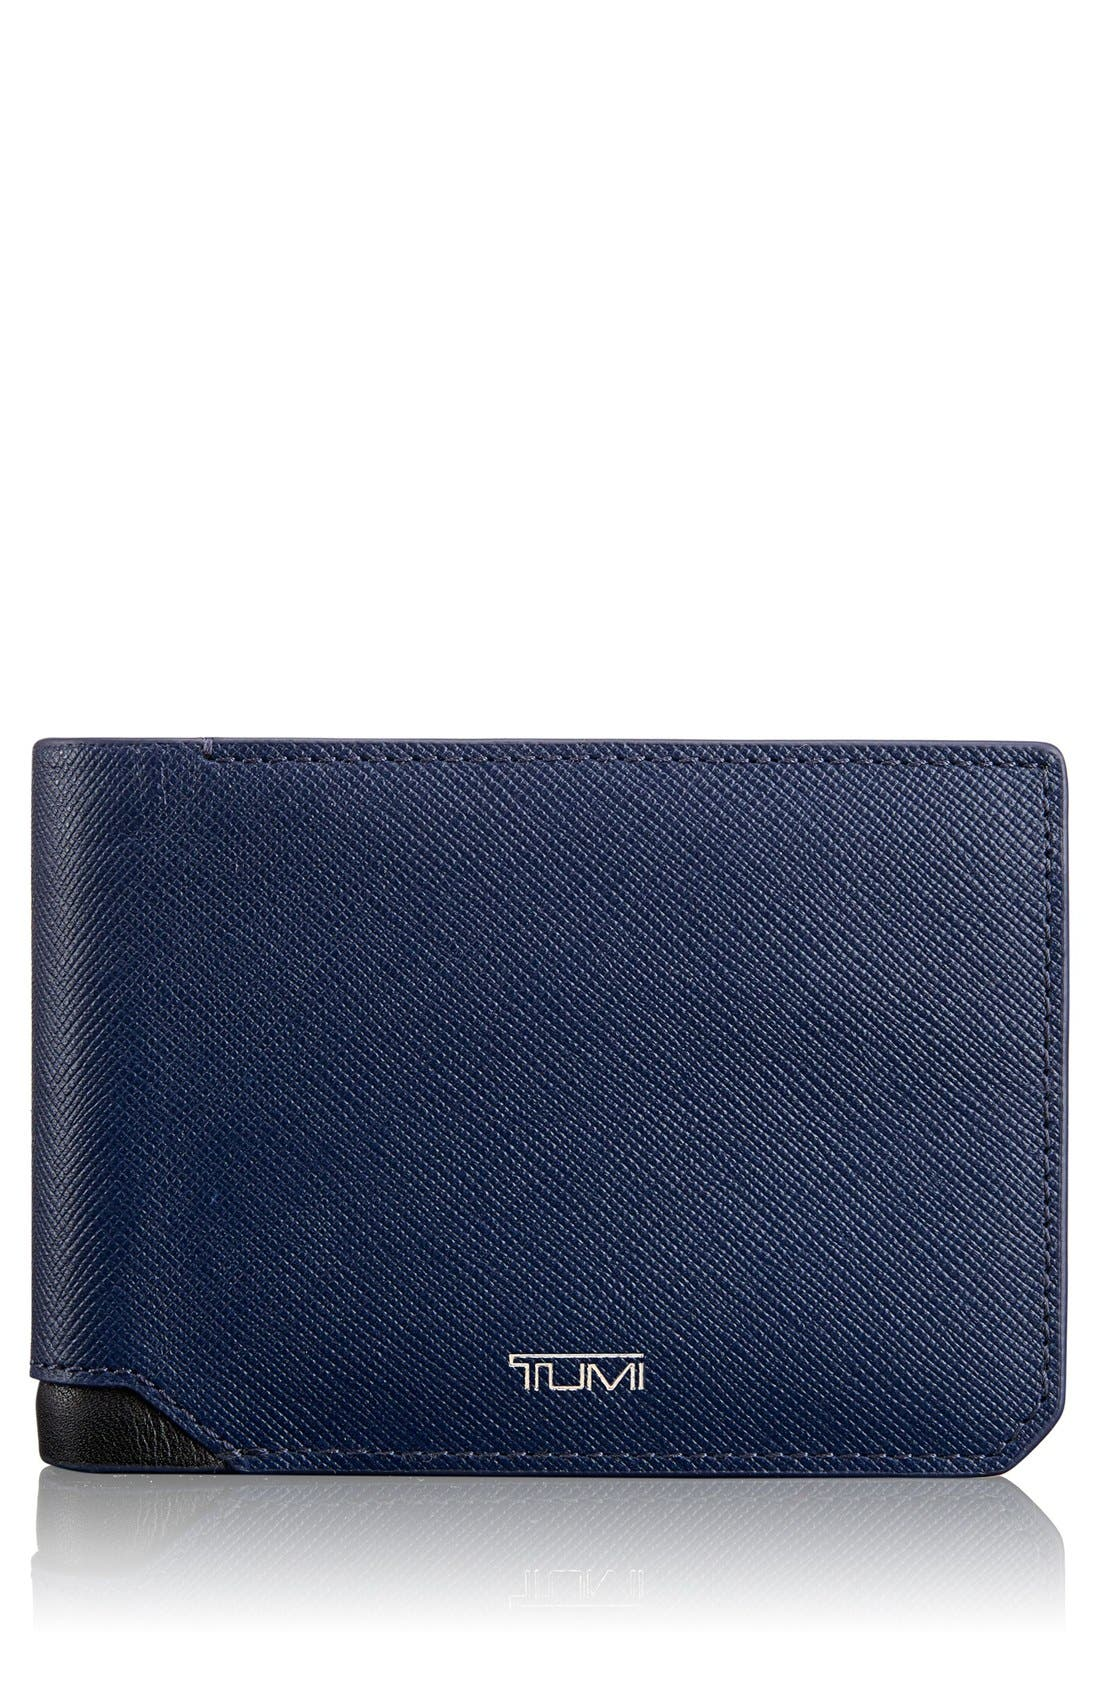 TUMI Mason Bifold Leather Wallet